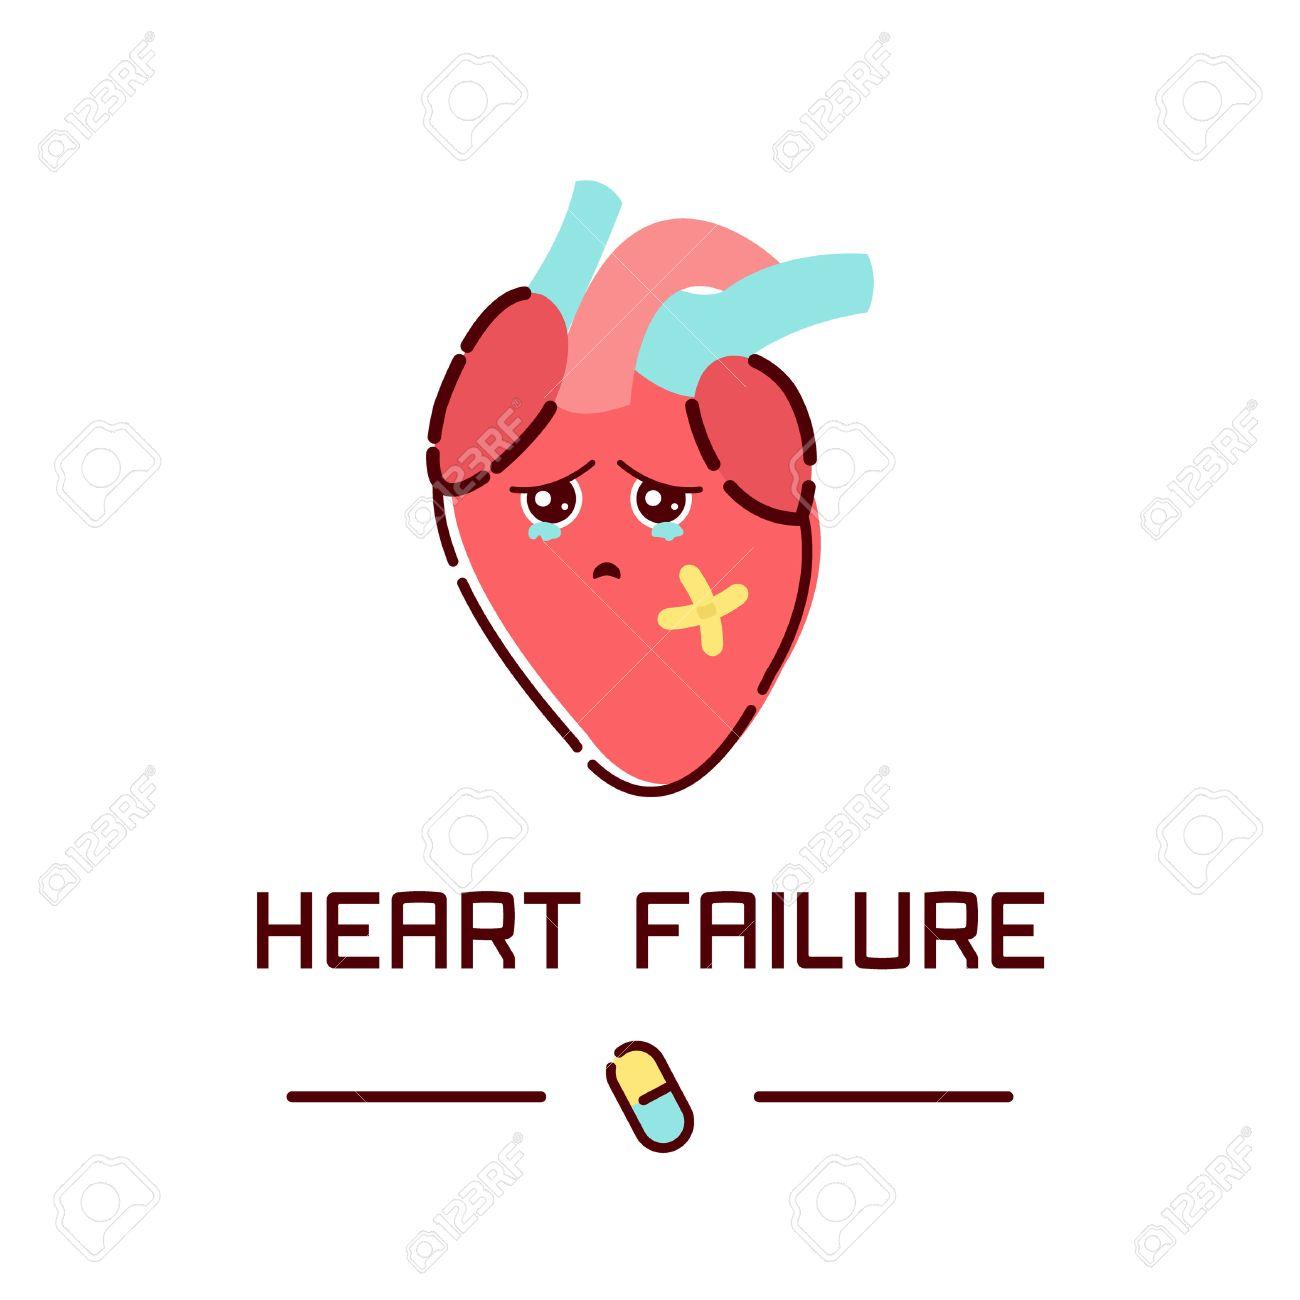 Heart Failure Disease Awareness Poster With Sad Cartoon Heart ...